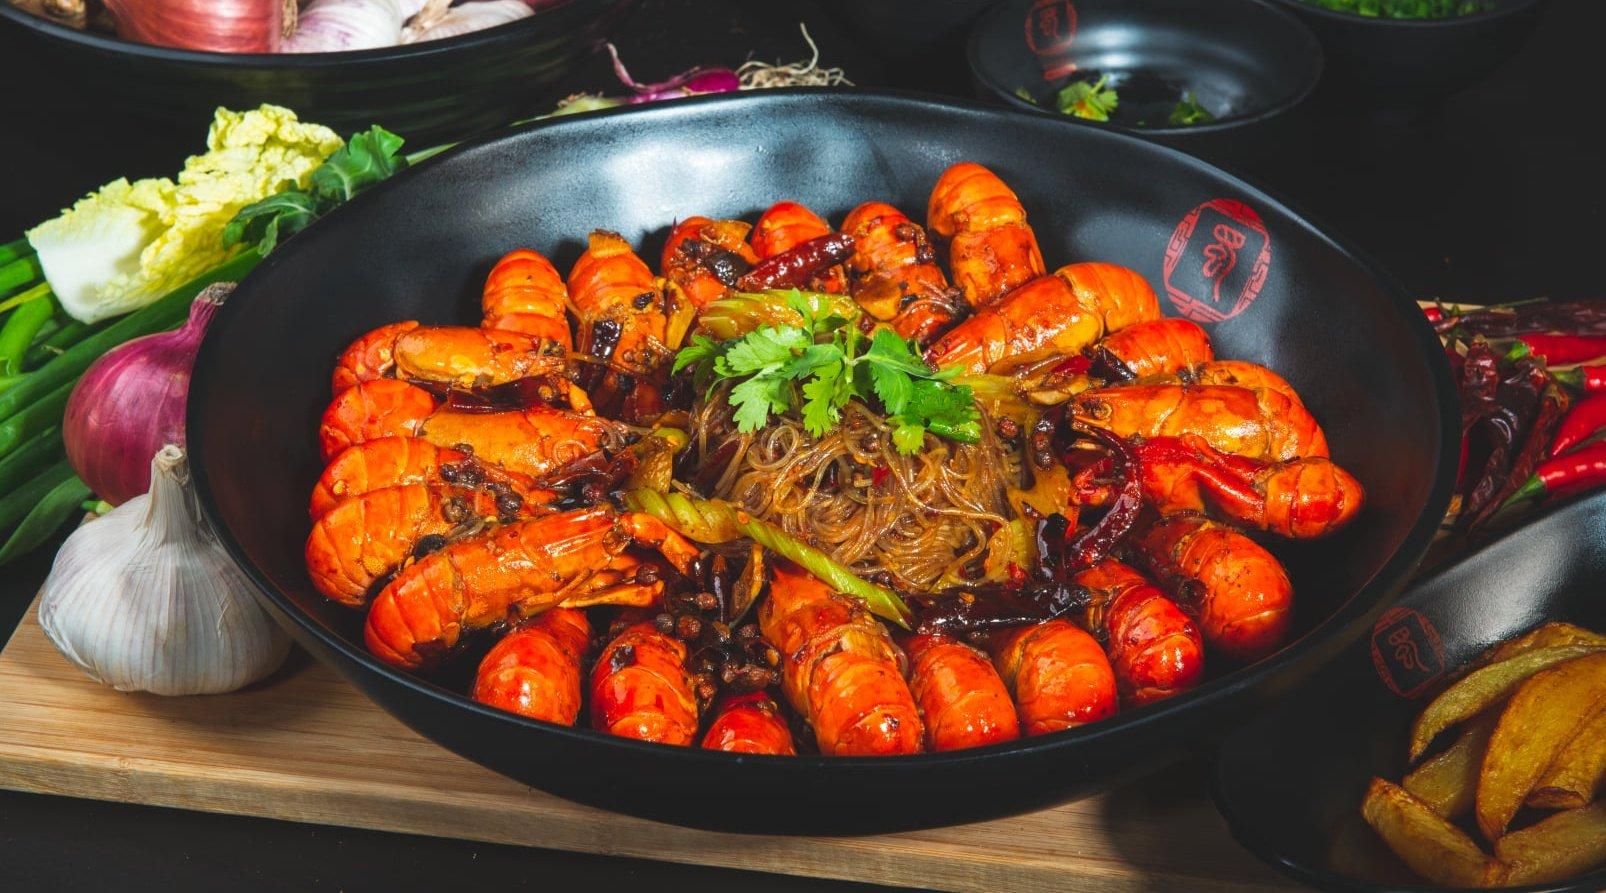 SHU Spicy Pot 蜀麻辣香锅 - Publika-麻辣小龍蝦|1 公斤